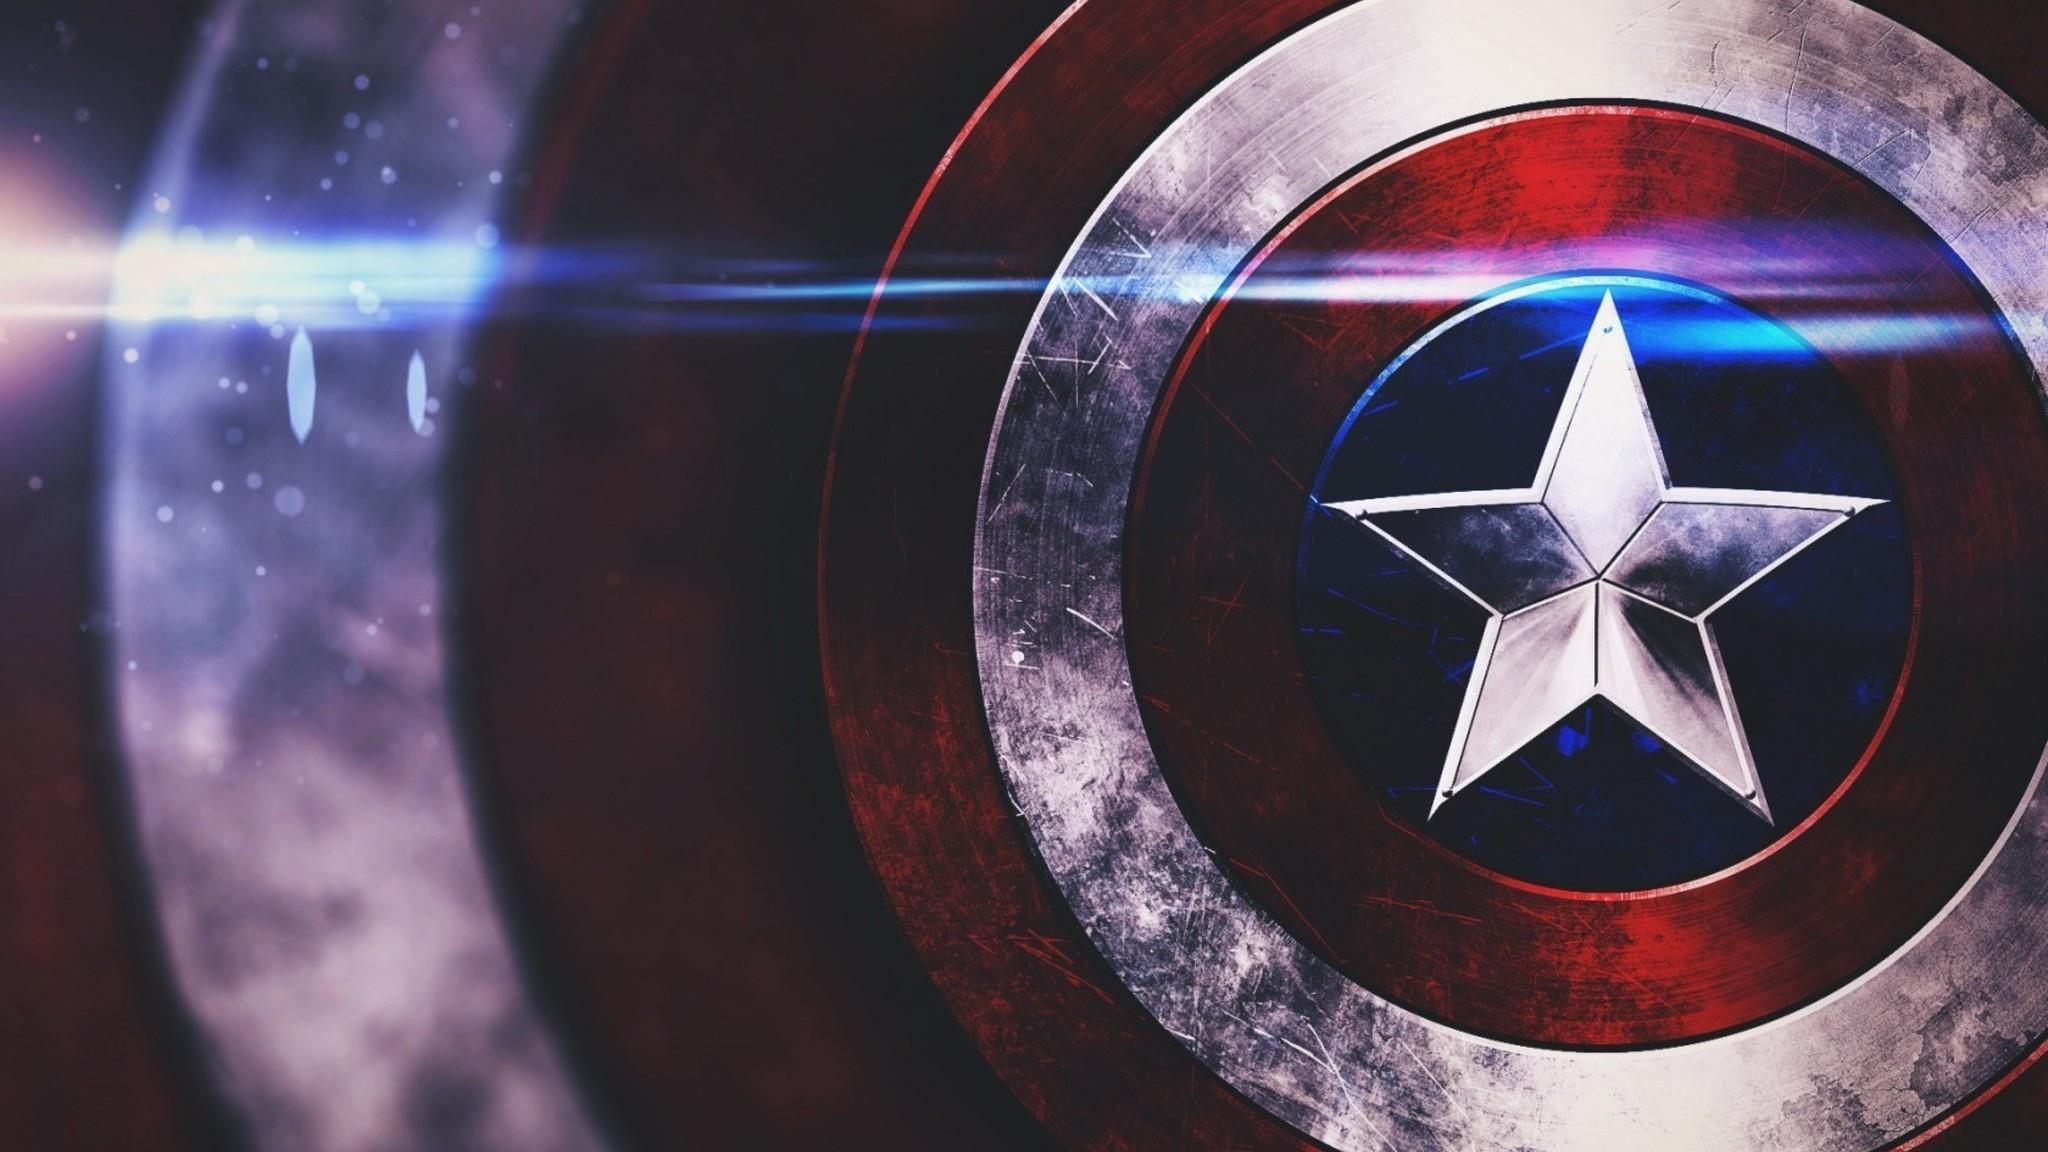 Download Captain America Shield Wallpaper Hd Hd Backgrounds